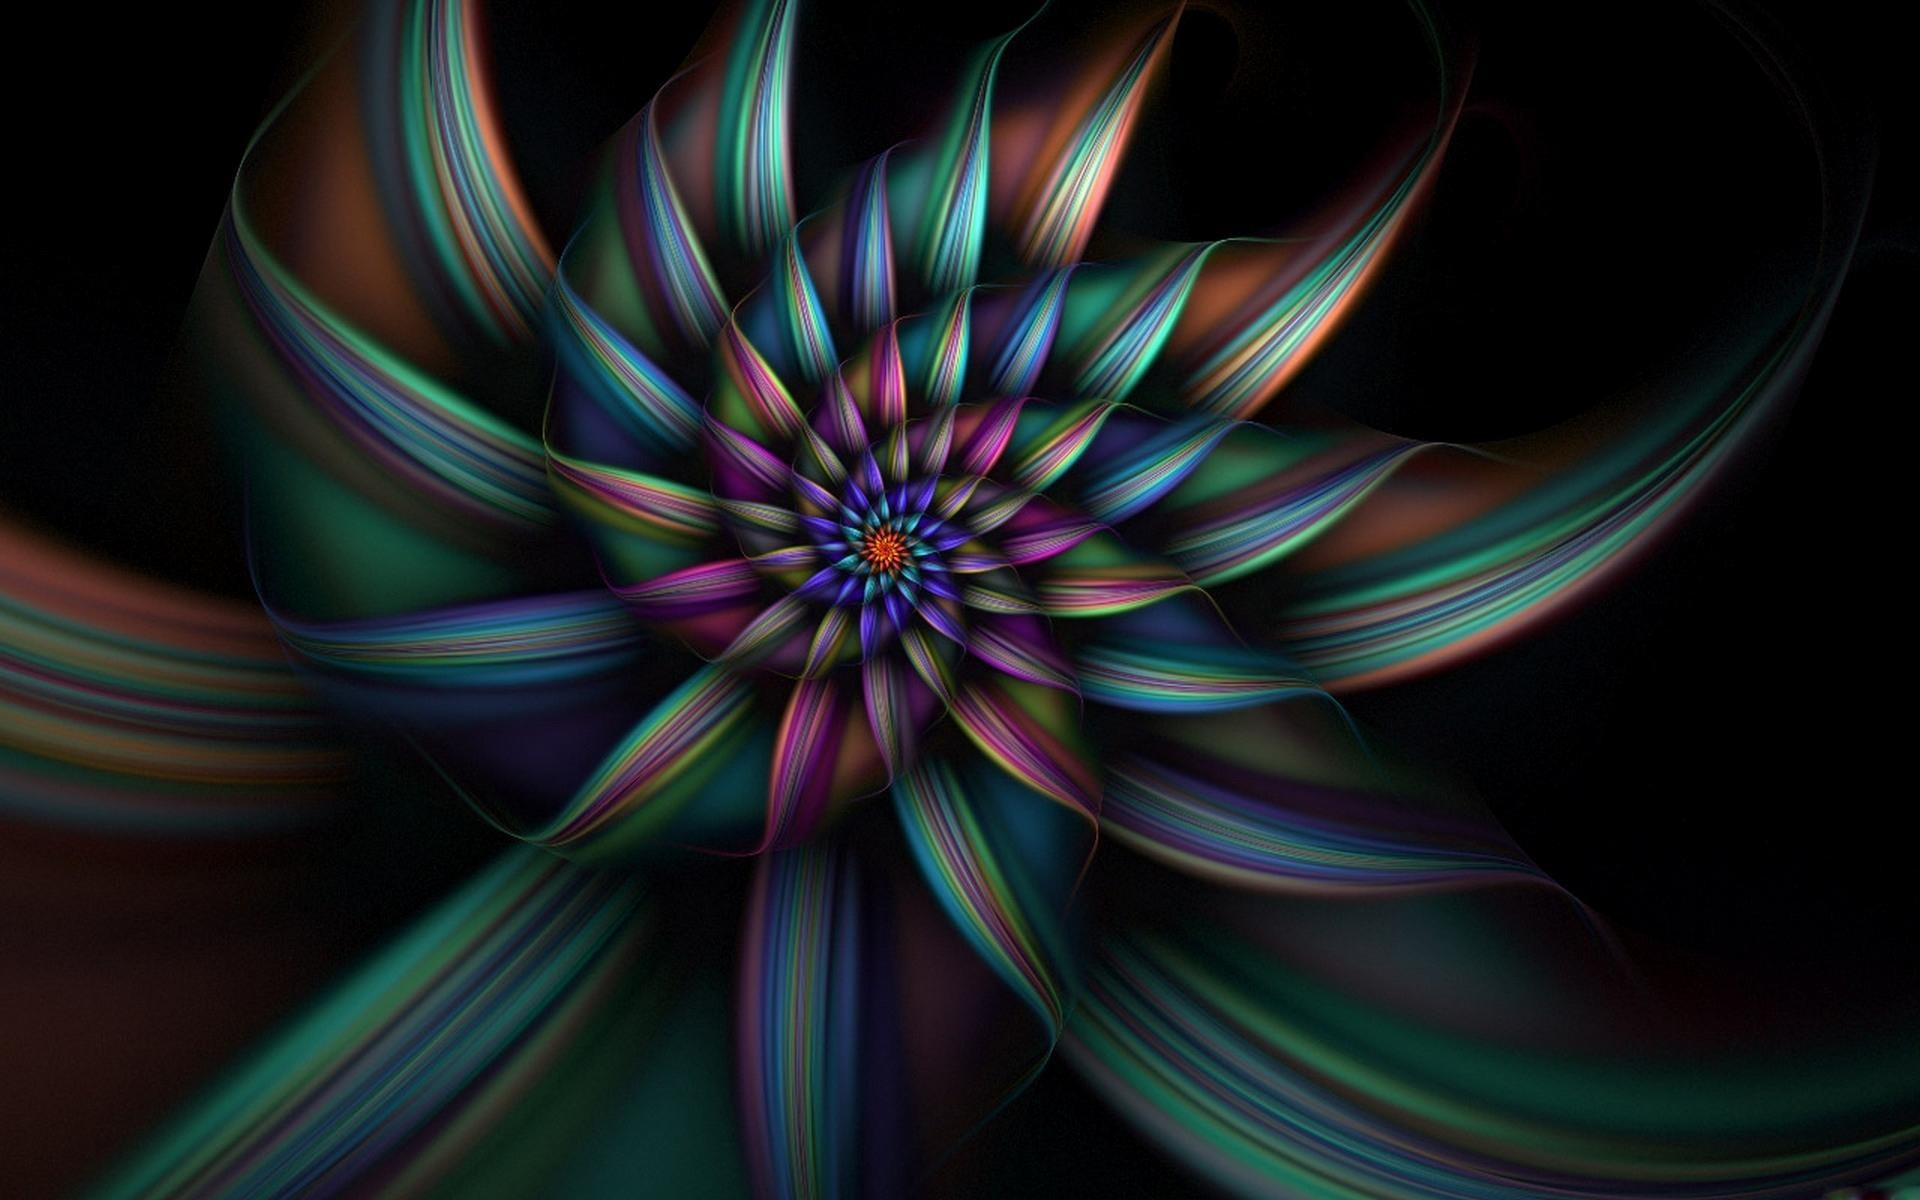 Abstract-Wallpaper-HD-Widescreen-hd-wallpaper-download